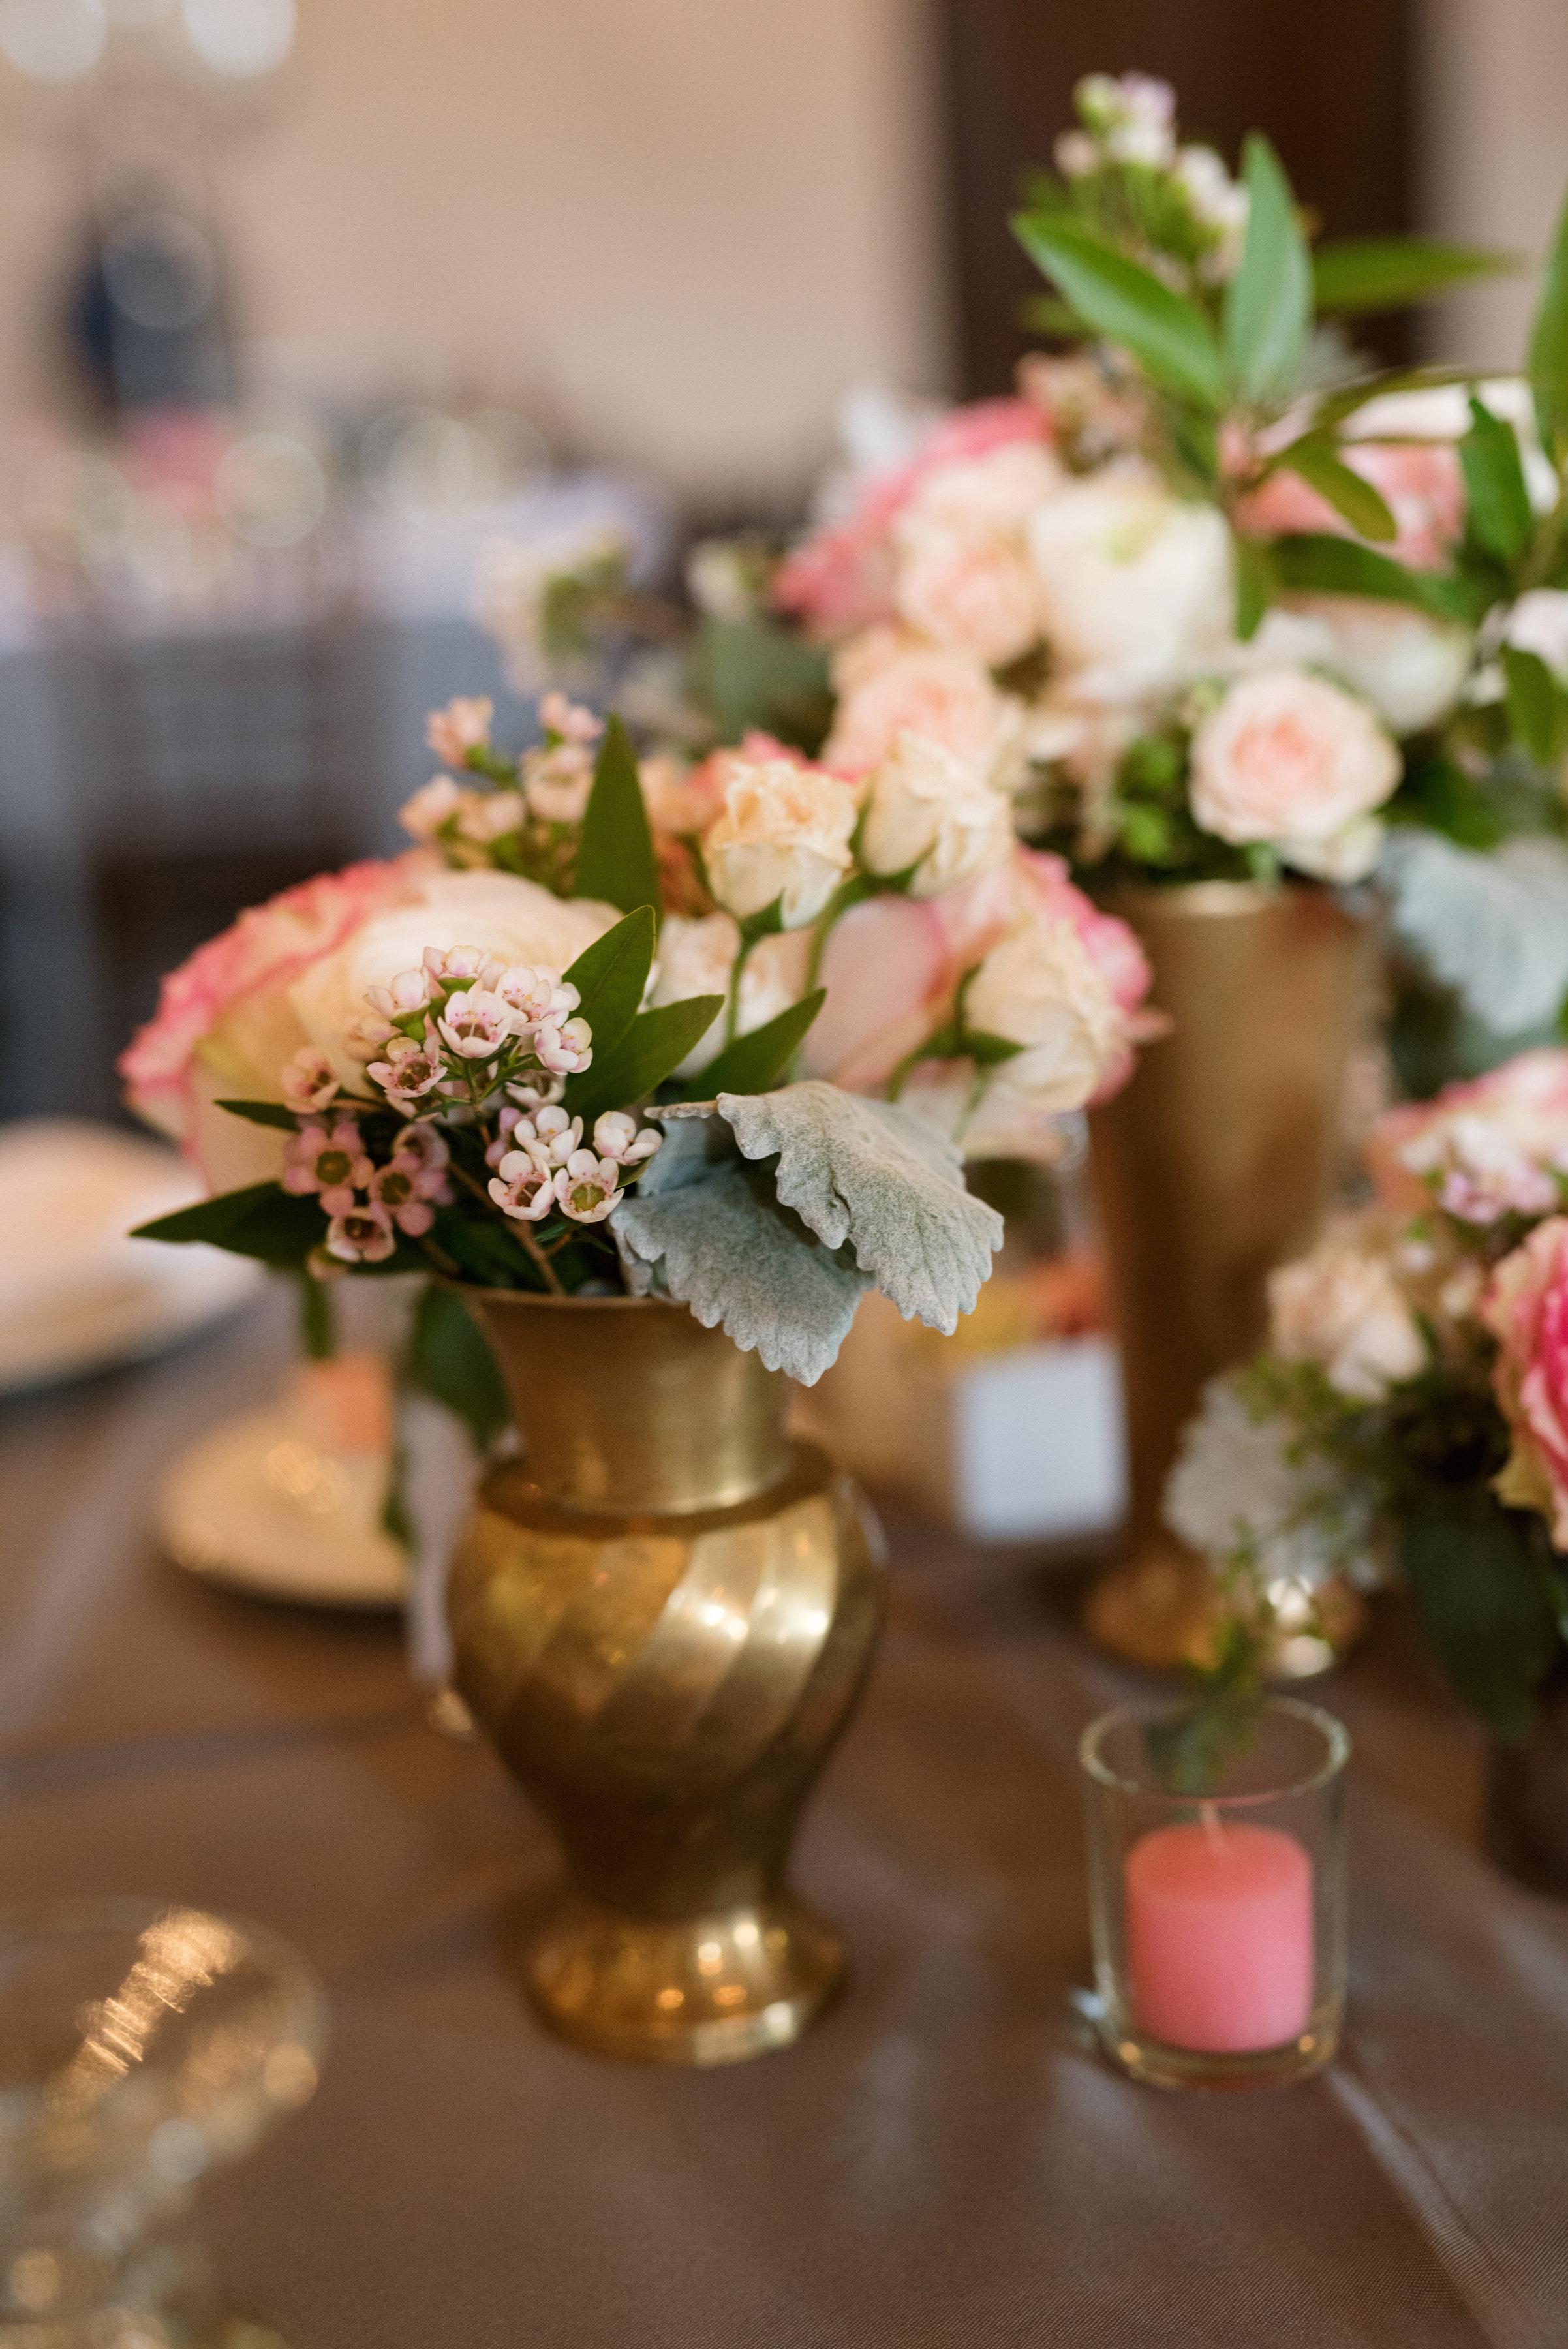 Ma Maison Austin Wedding Venue_ Austin Wedding Planner Heavenly Day Events _ Kristi Wright Austin Wedding Photographer20160306_0123.JPG